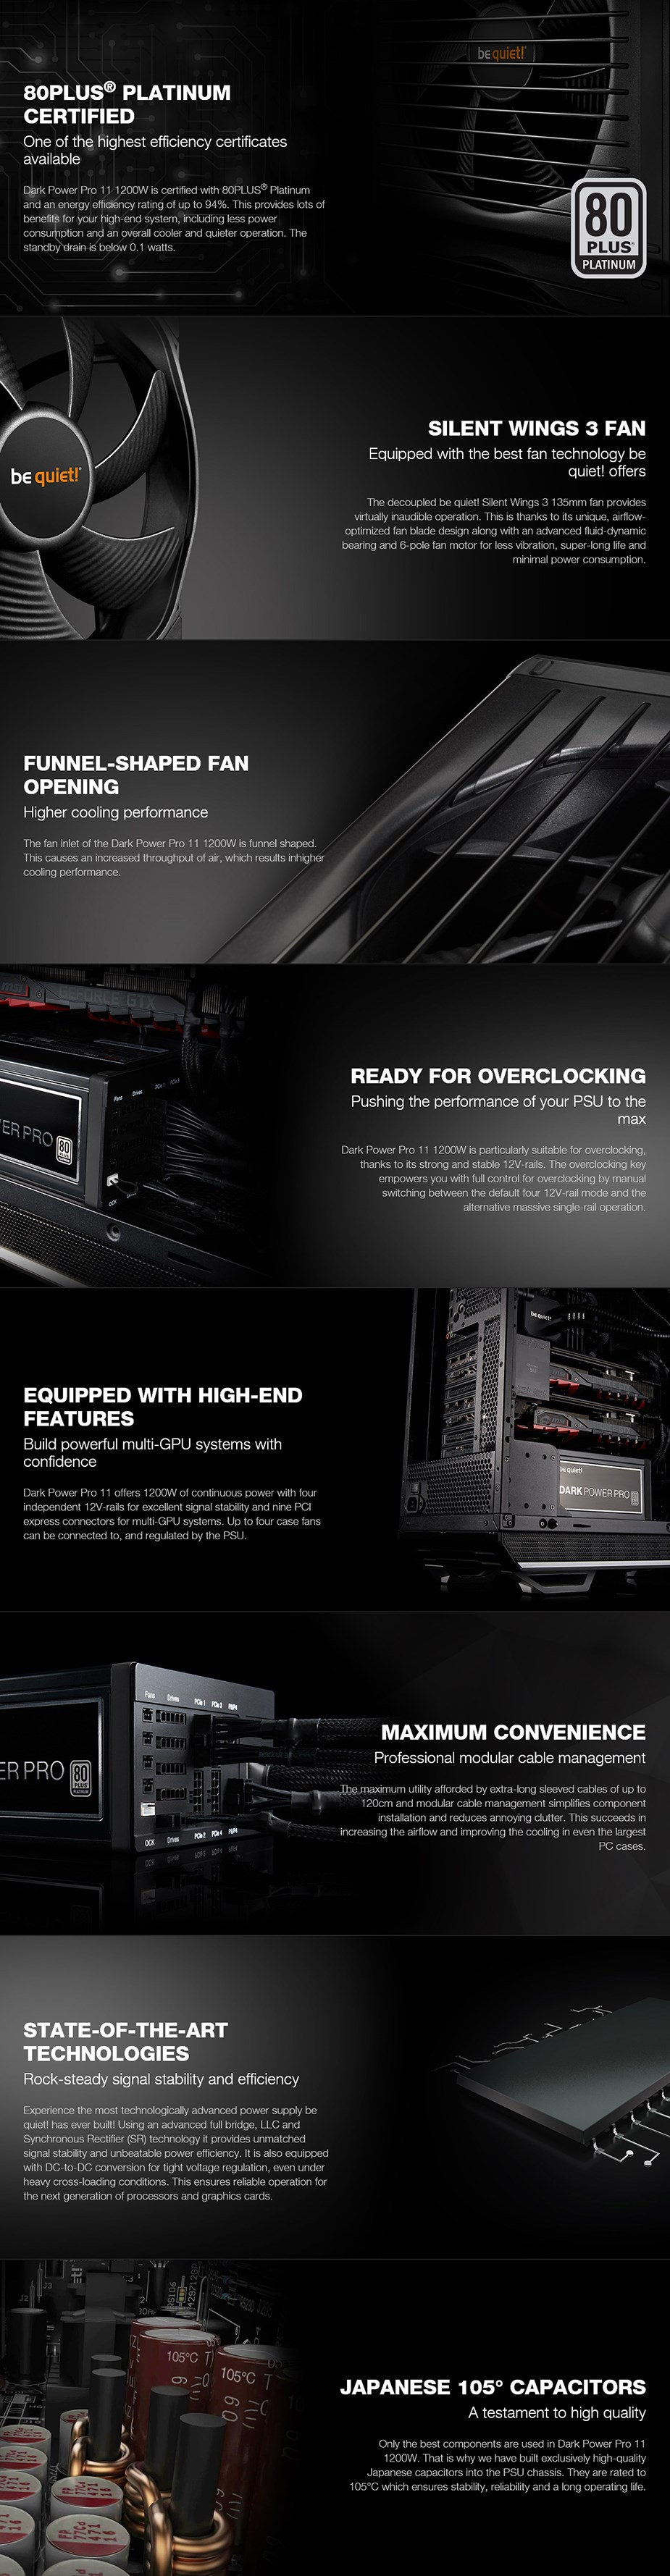 be quiet! Dark Power Pro 11 1200W 80+ Platinum Semi-Modular Power Supply - Desktop Overview 1